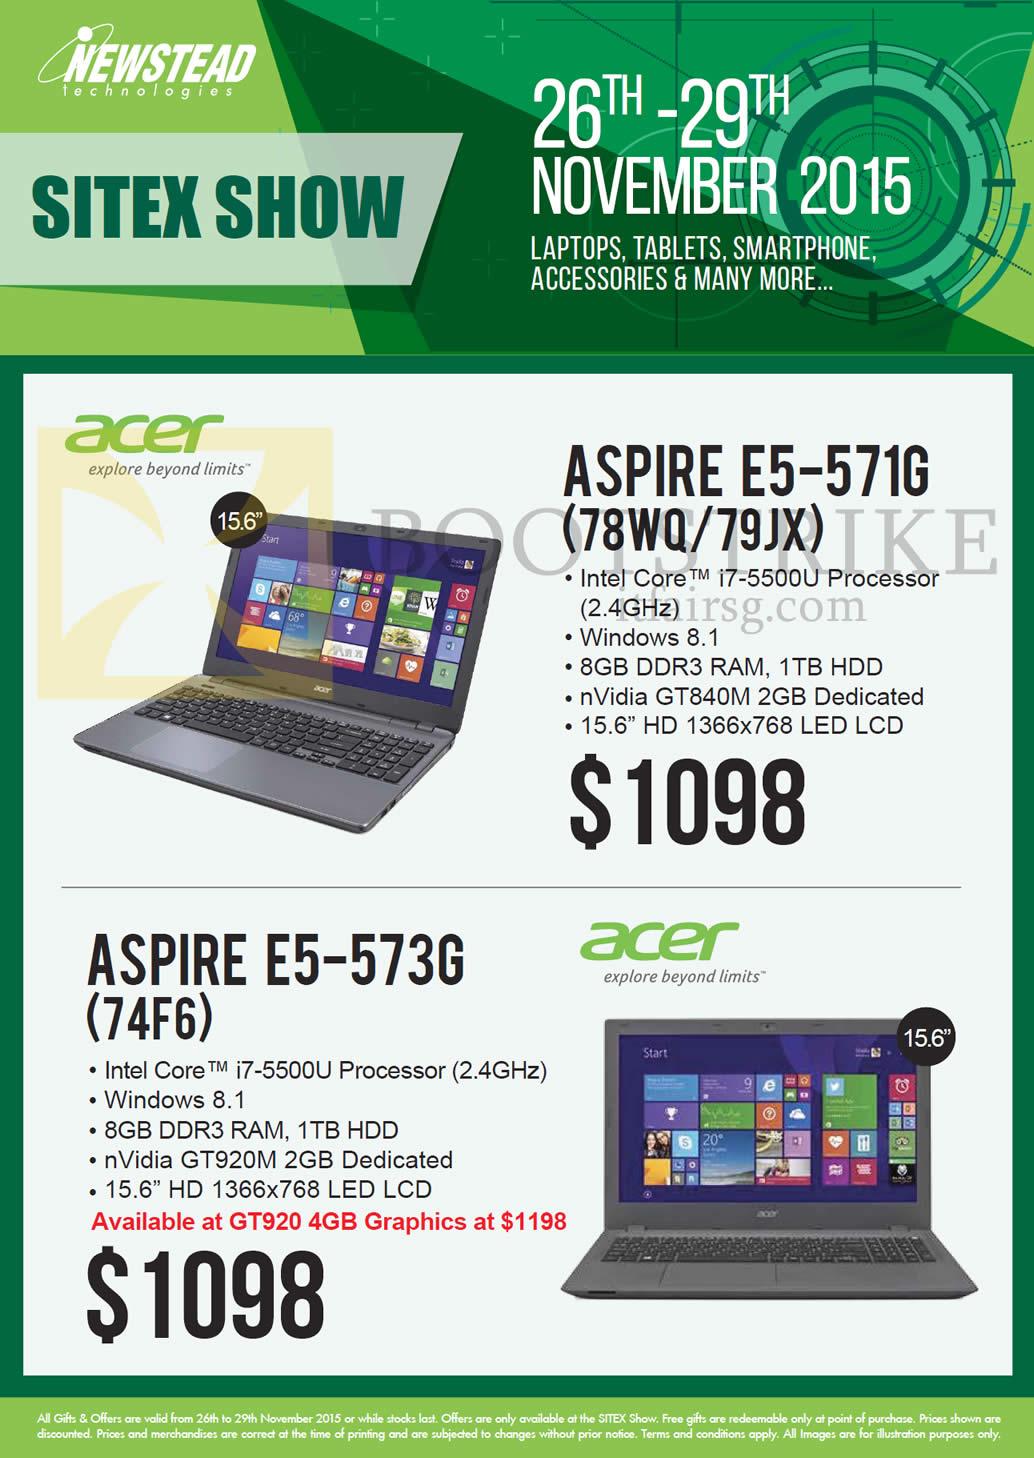 SITEX 2015 price list image brochure of Acer Newstead Notebooks, Aspire E5-571G (78WQ79JX), E5-573G (74F6)